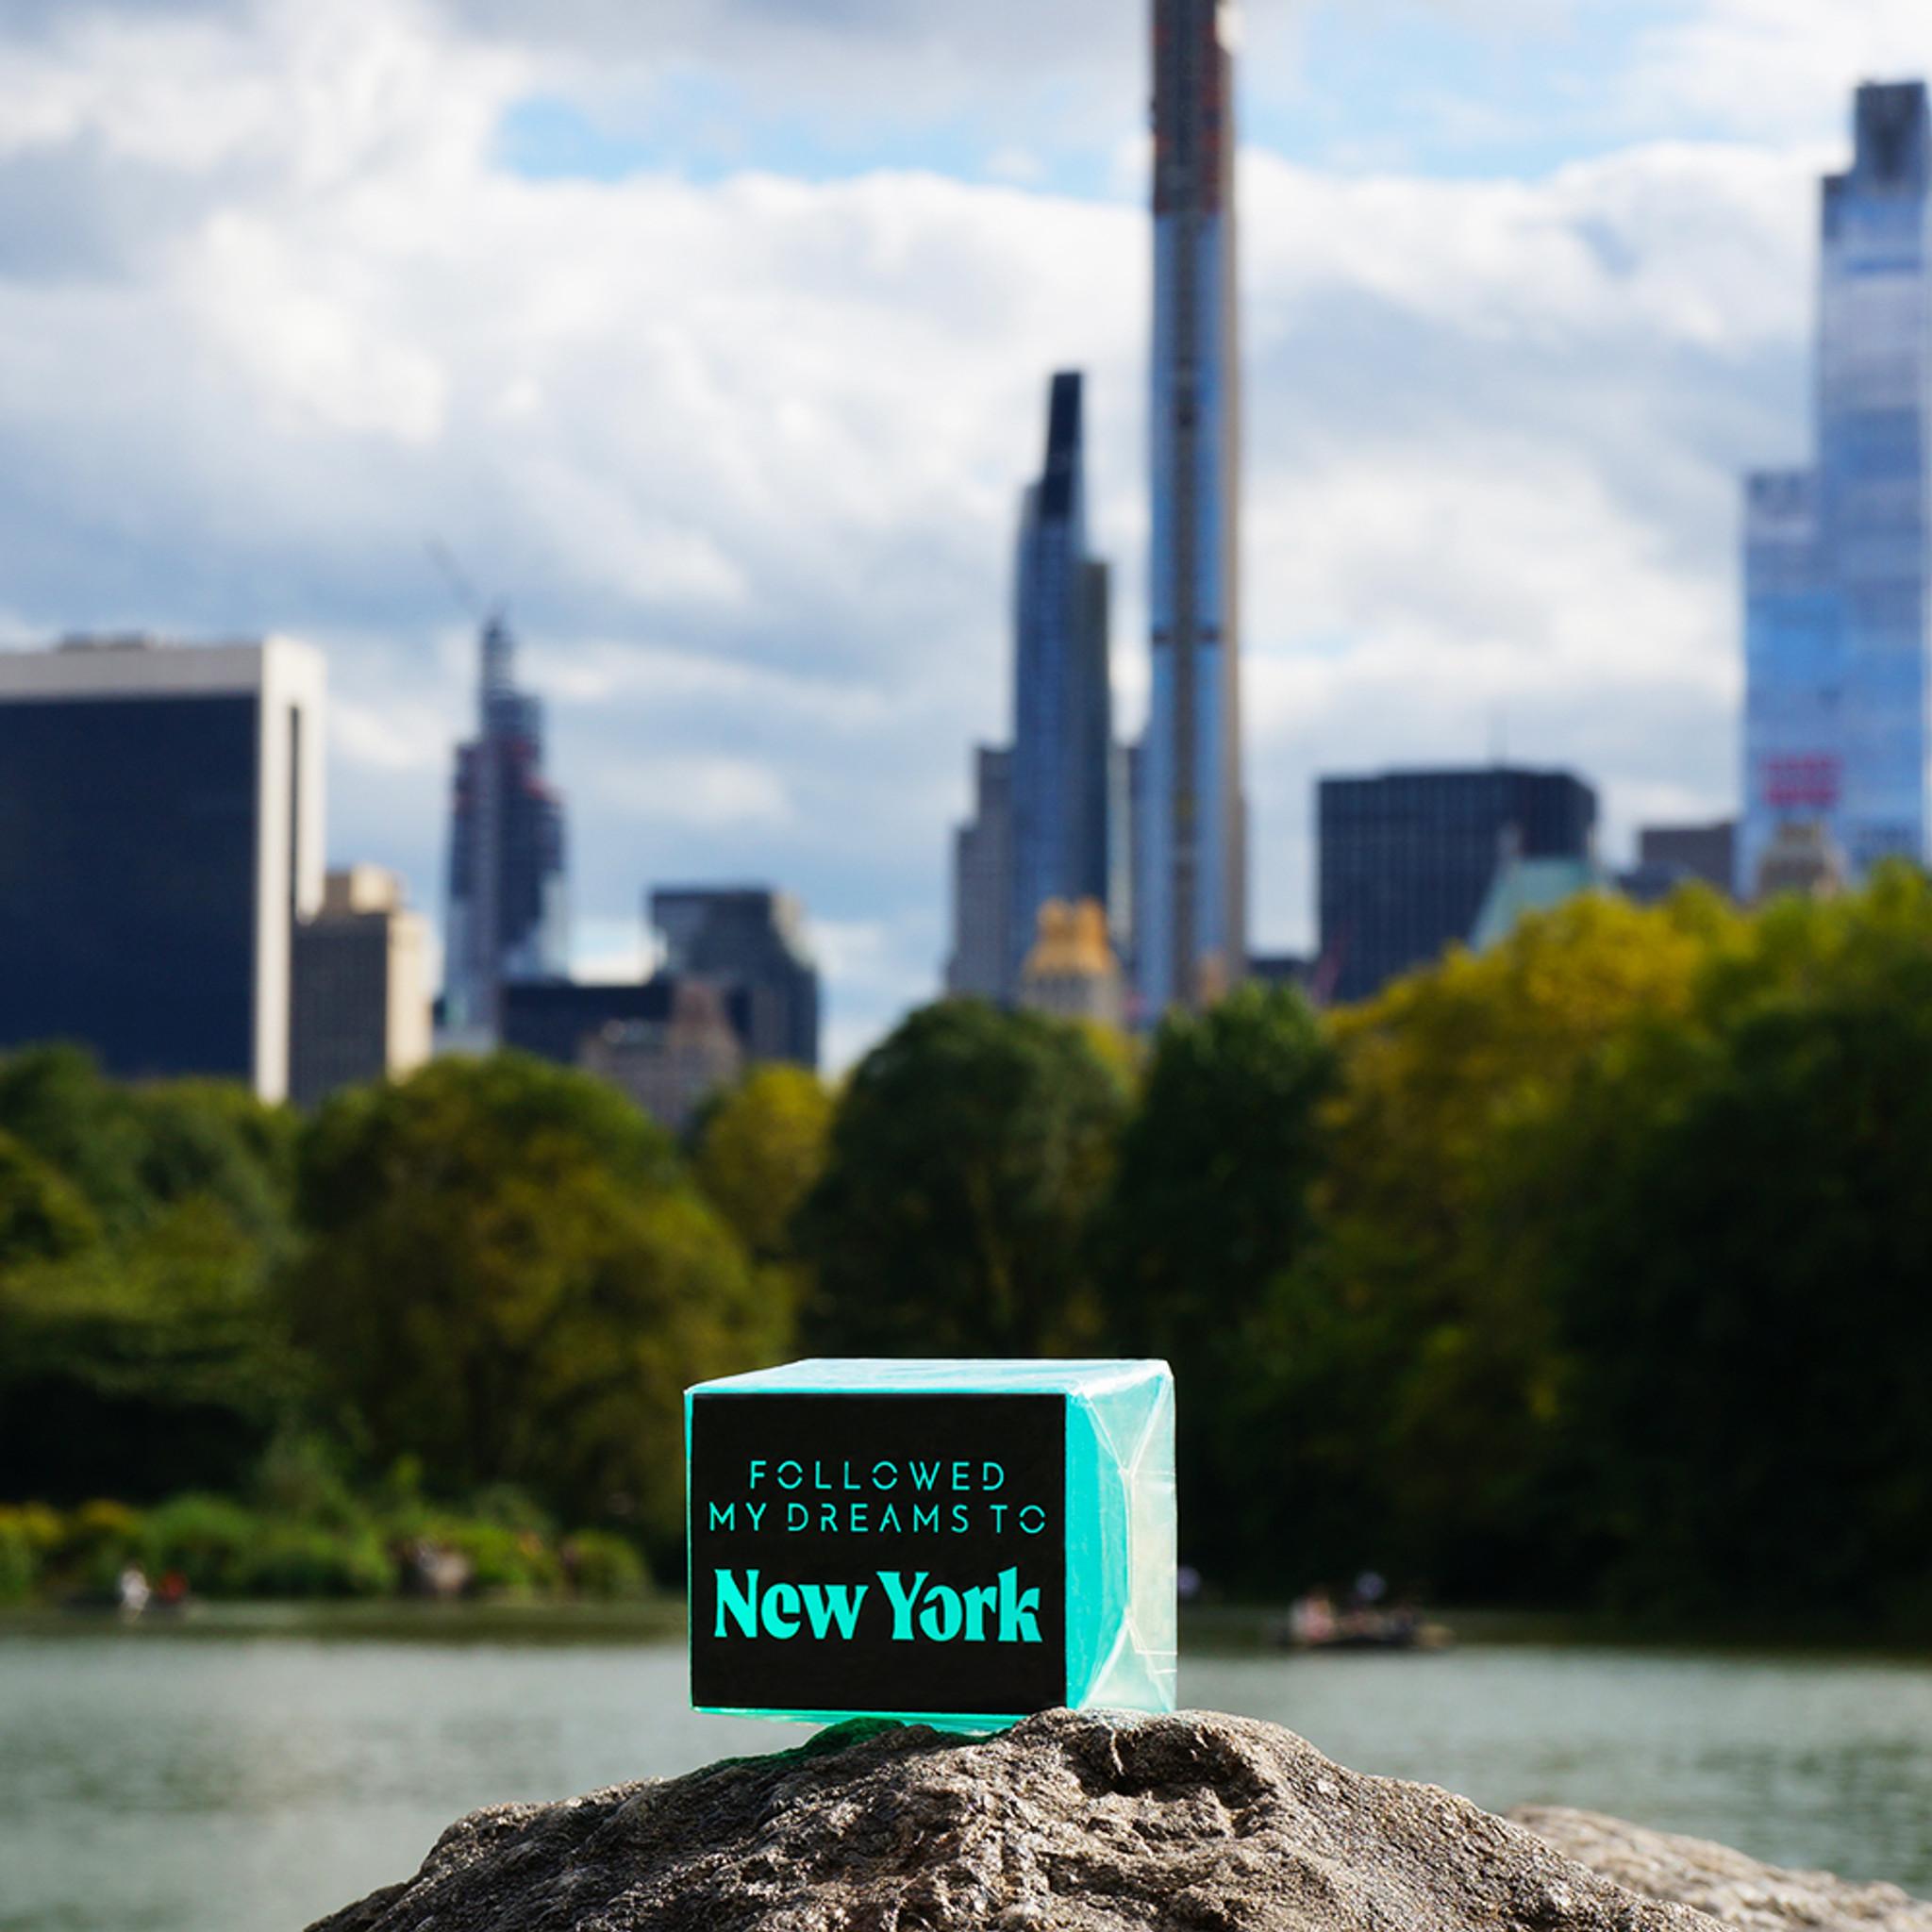 followed my dreams to New York